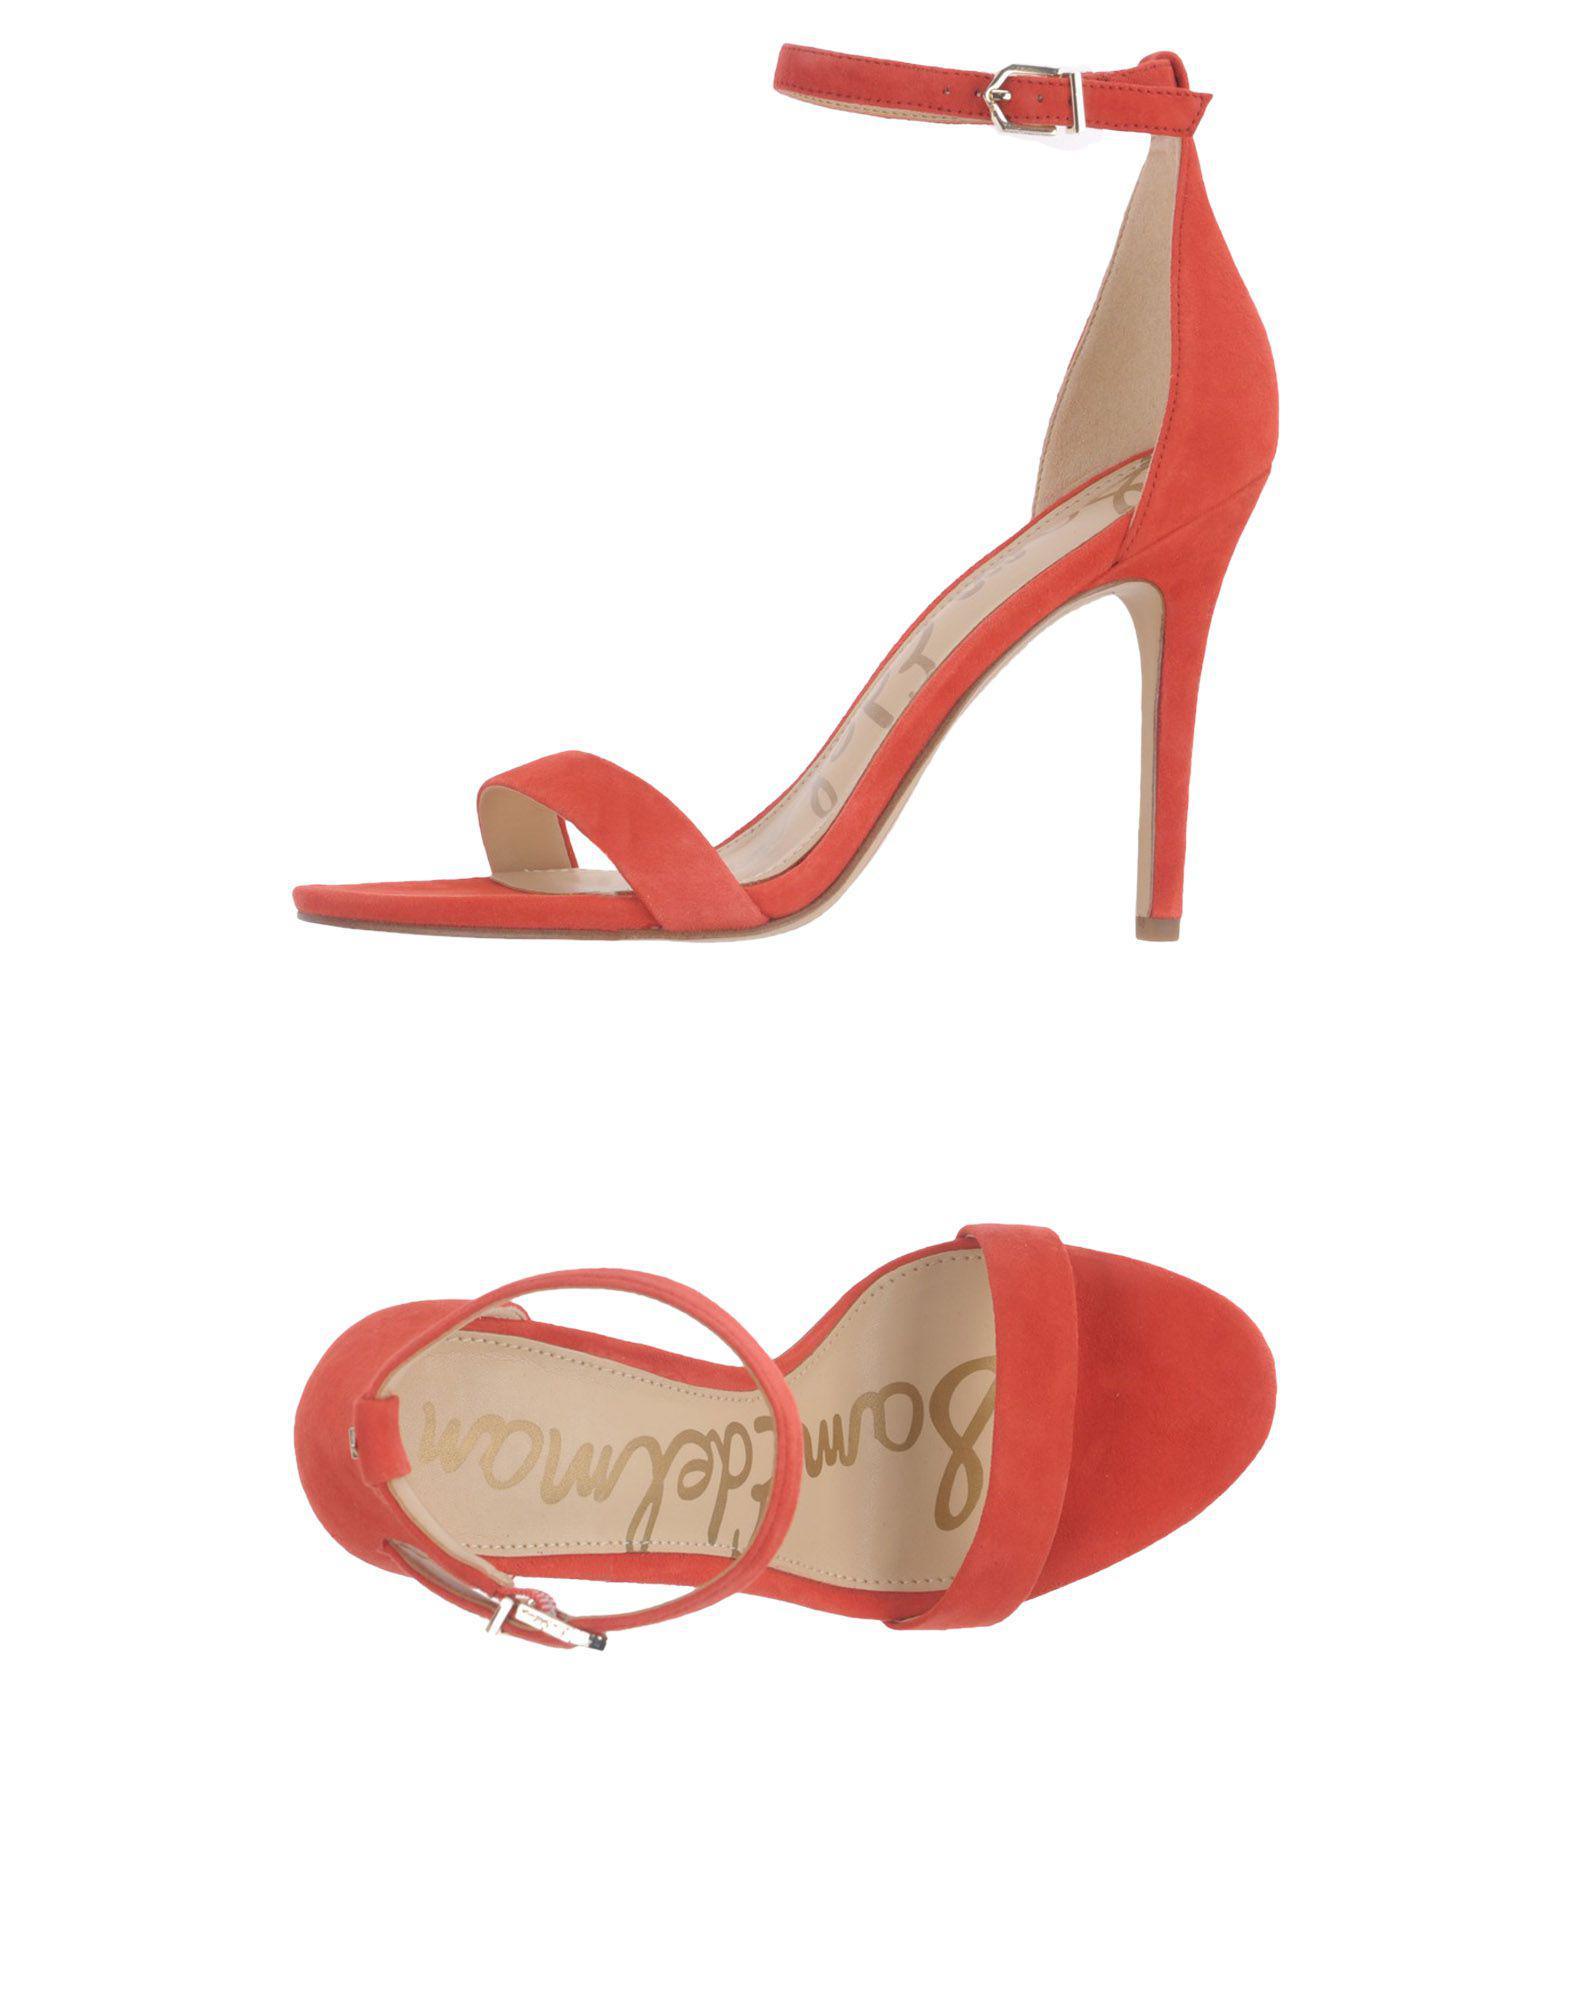 be37b58a6e56f2 Lyst - Sam Edelman Eleanor Suede Platform Stiletto Sandals in Red